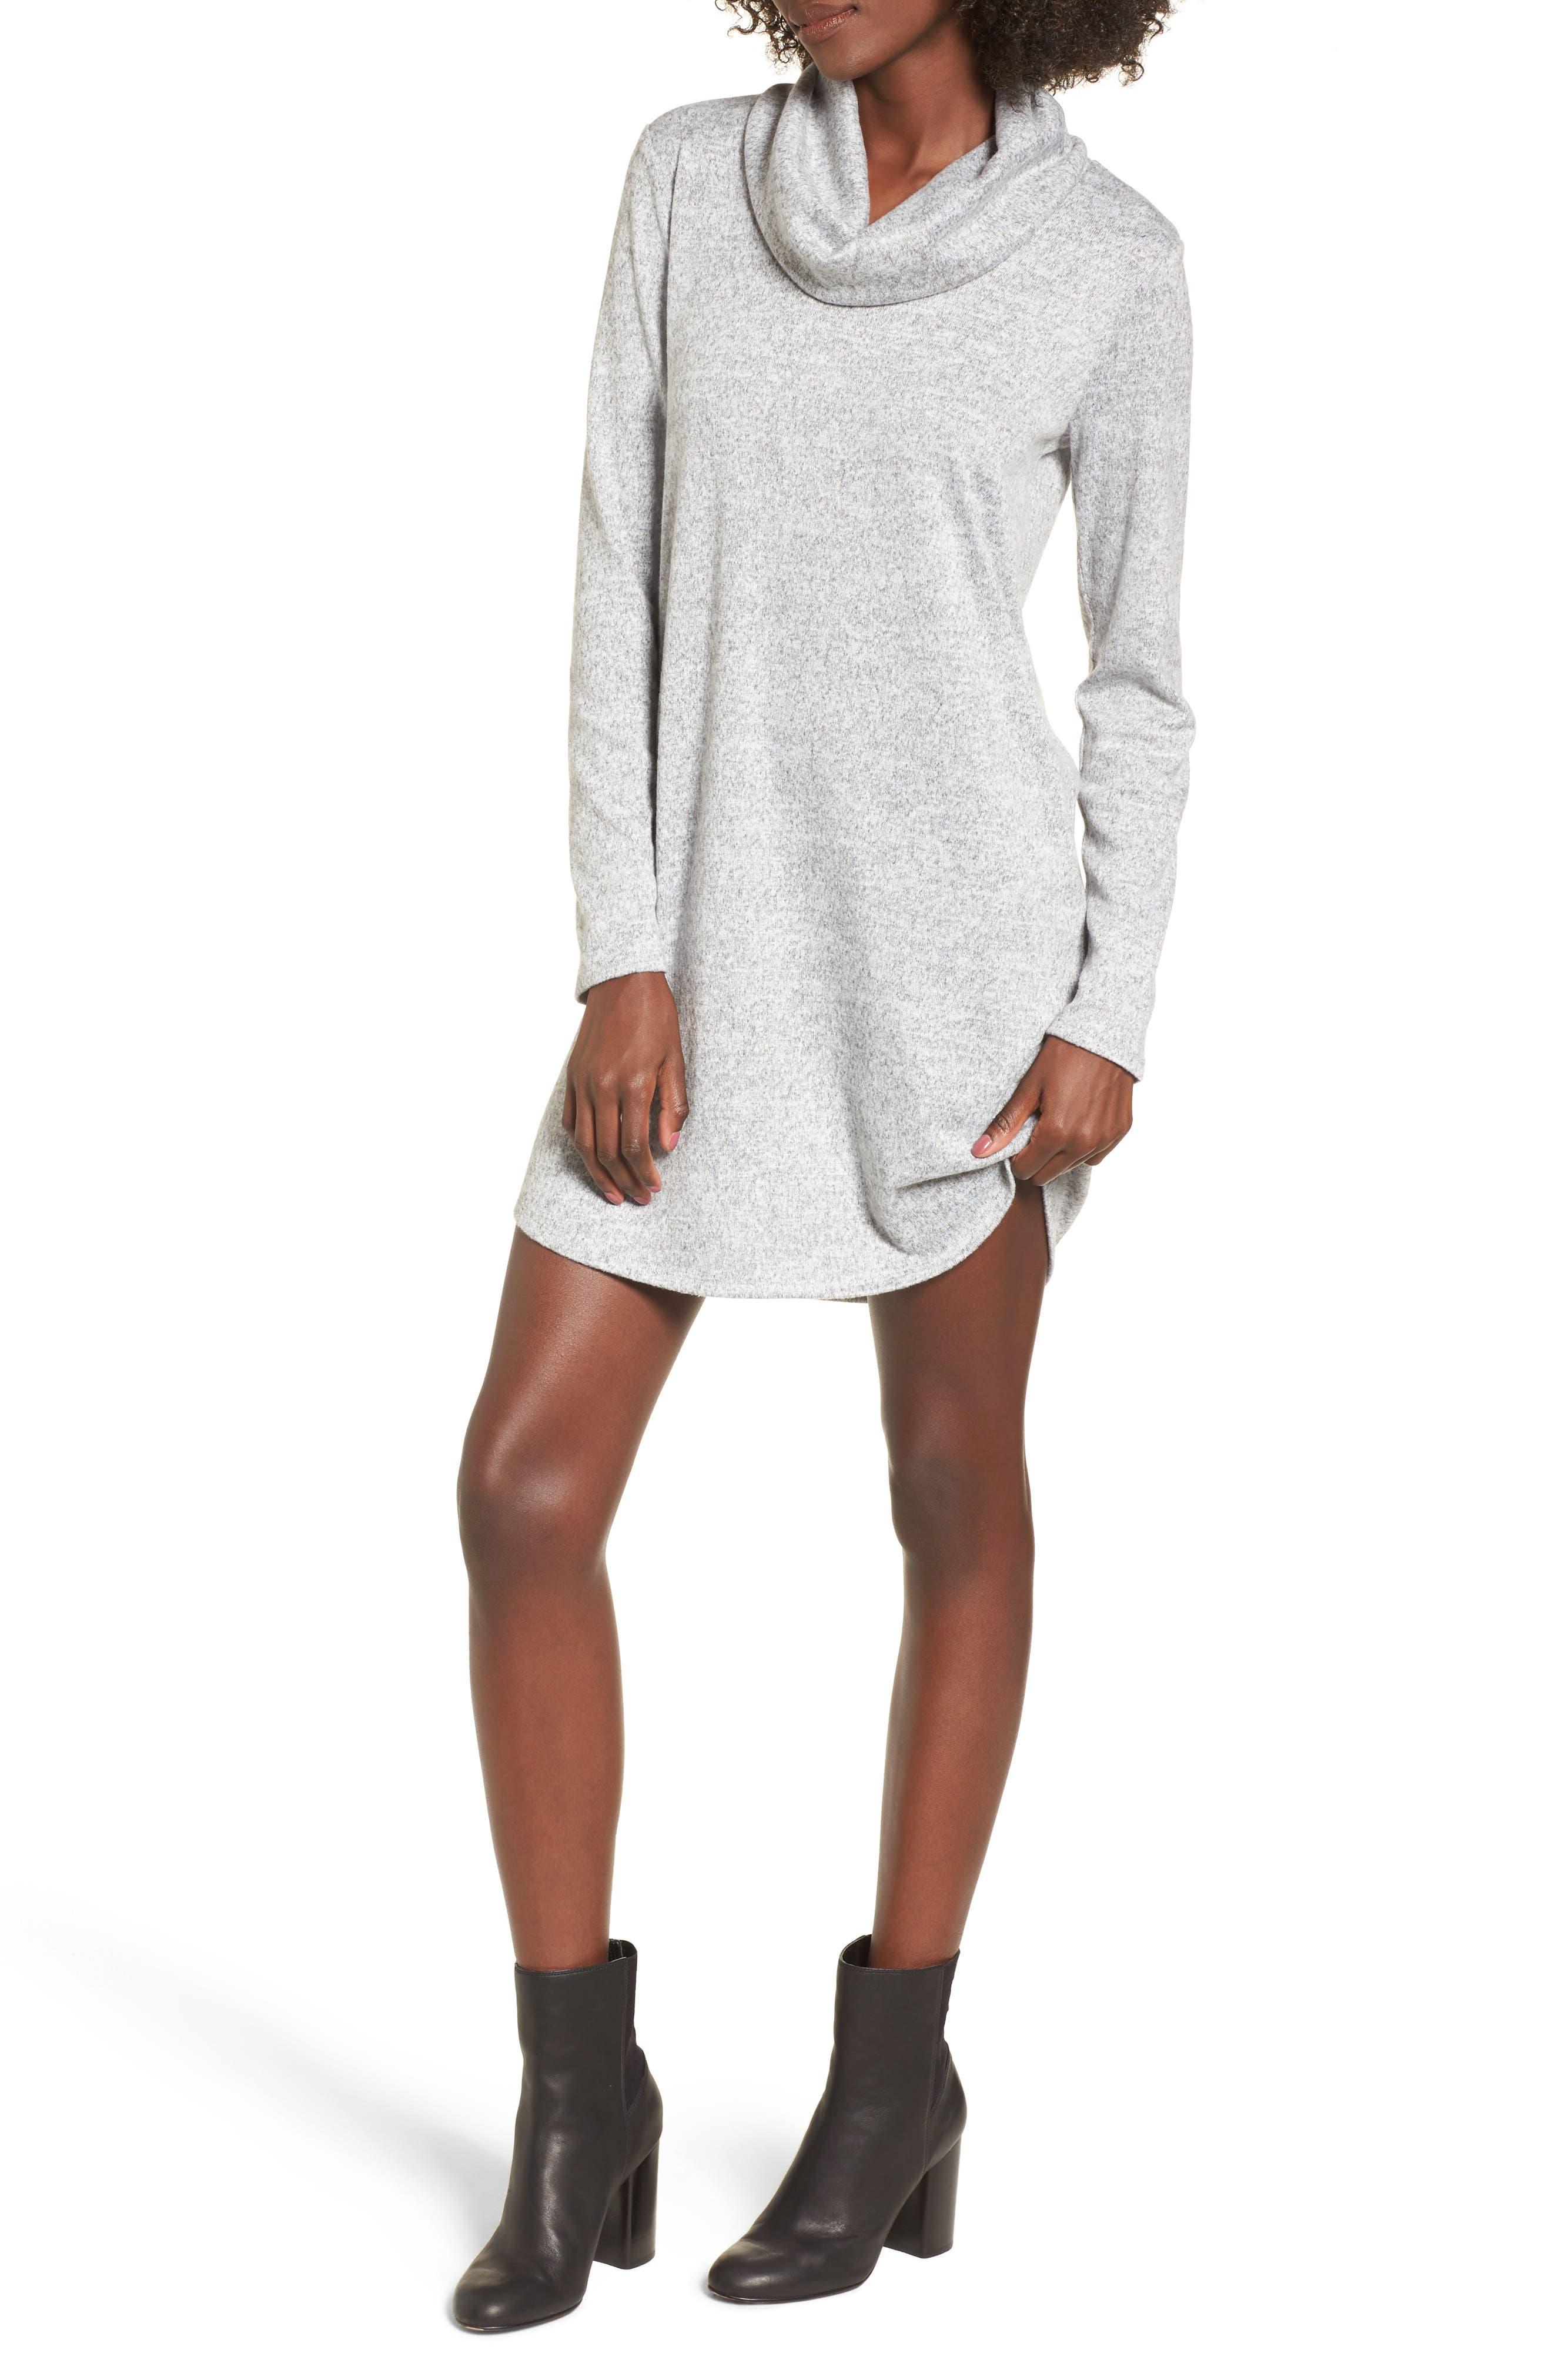 Main Image - Socialite Savannah Brushed Cowl Sweater Dress